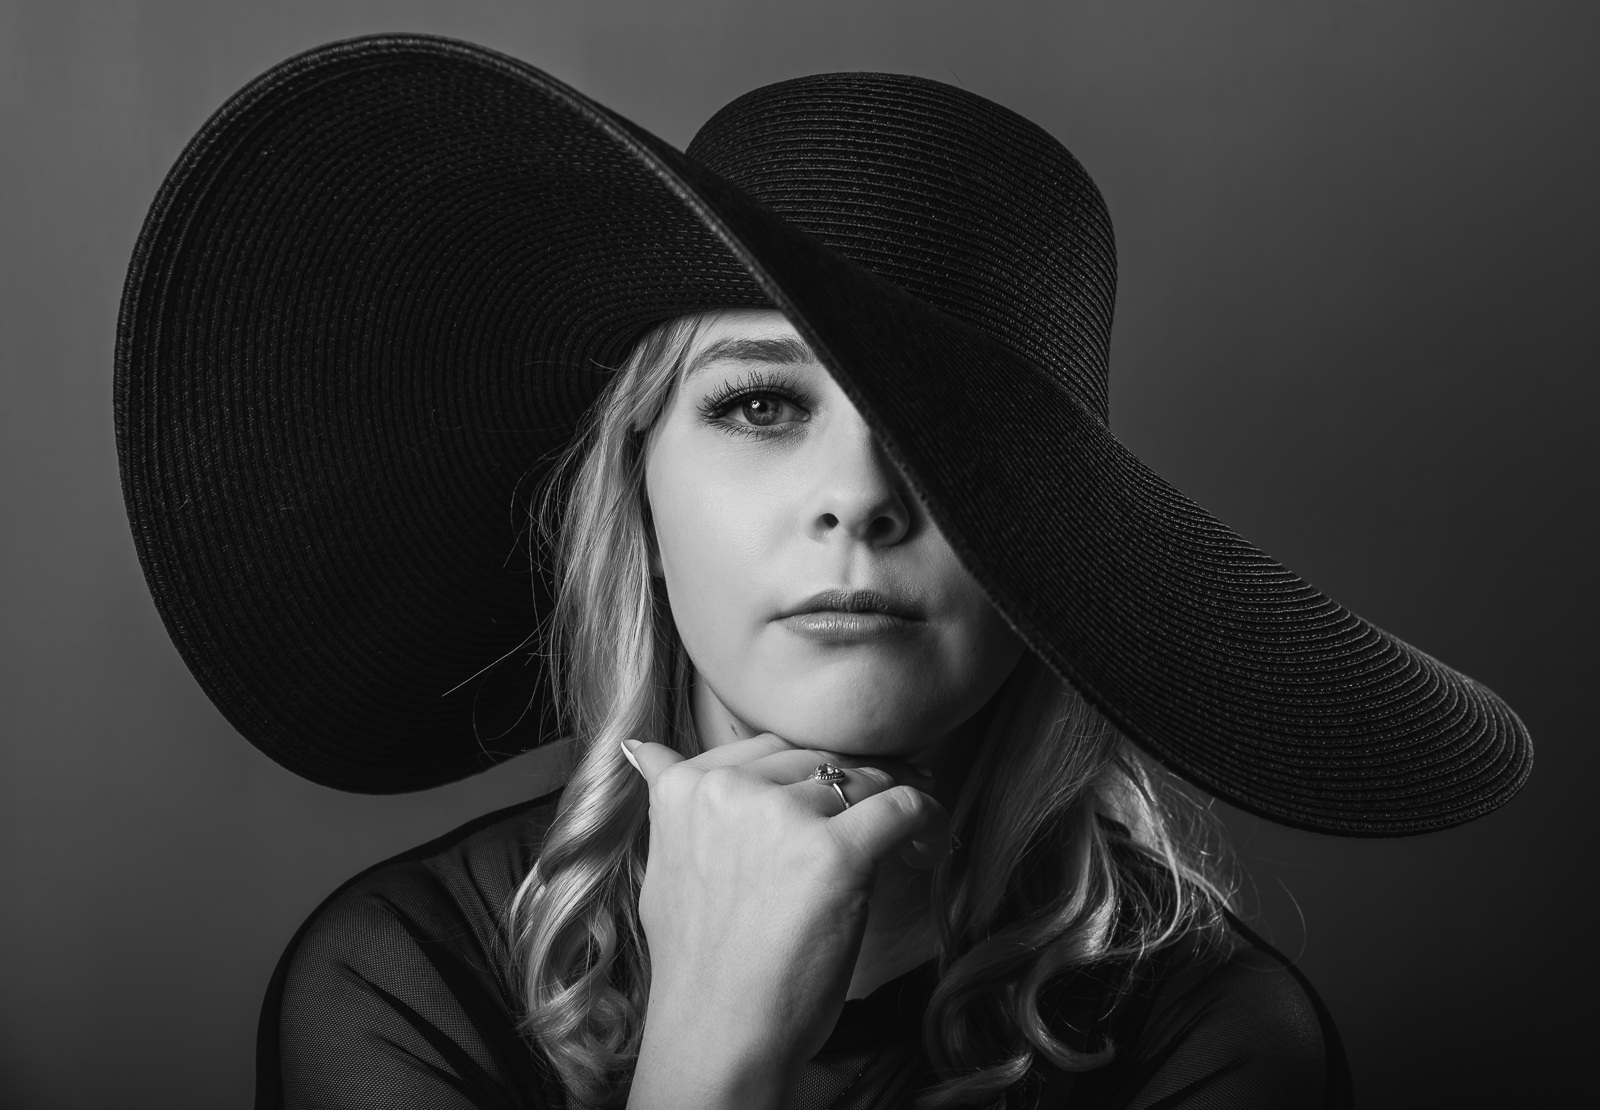 Carlien-Murray-Portrait-of-a-Lady-10